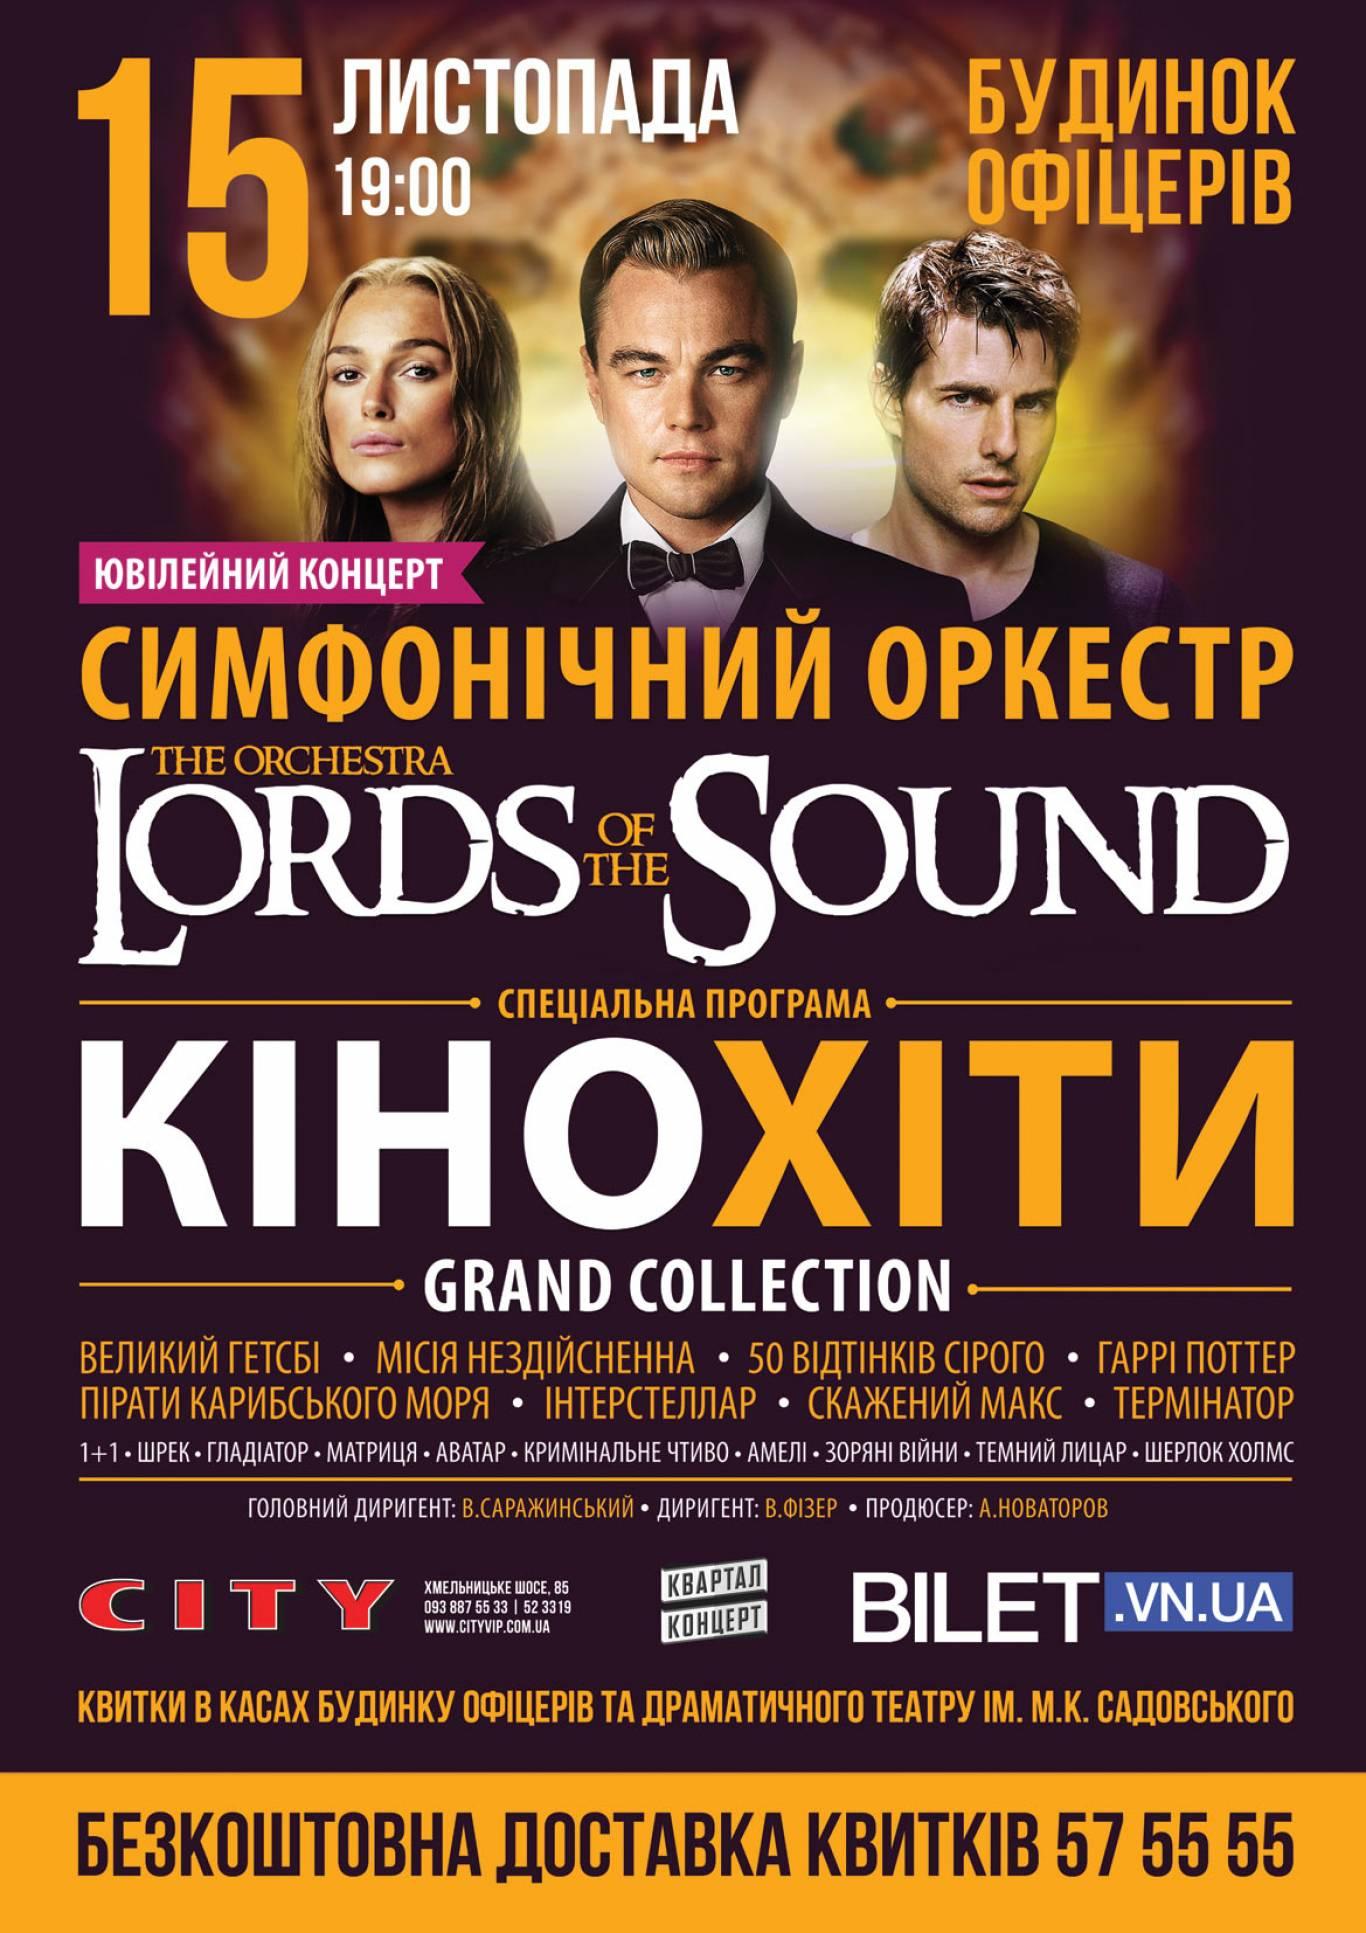 Lords of the Sound з новим шоу «Кінохіти. Grand Collection»